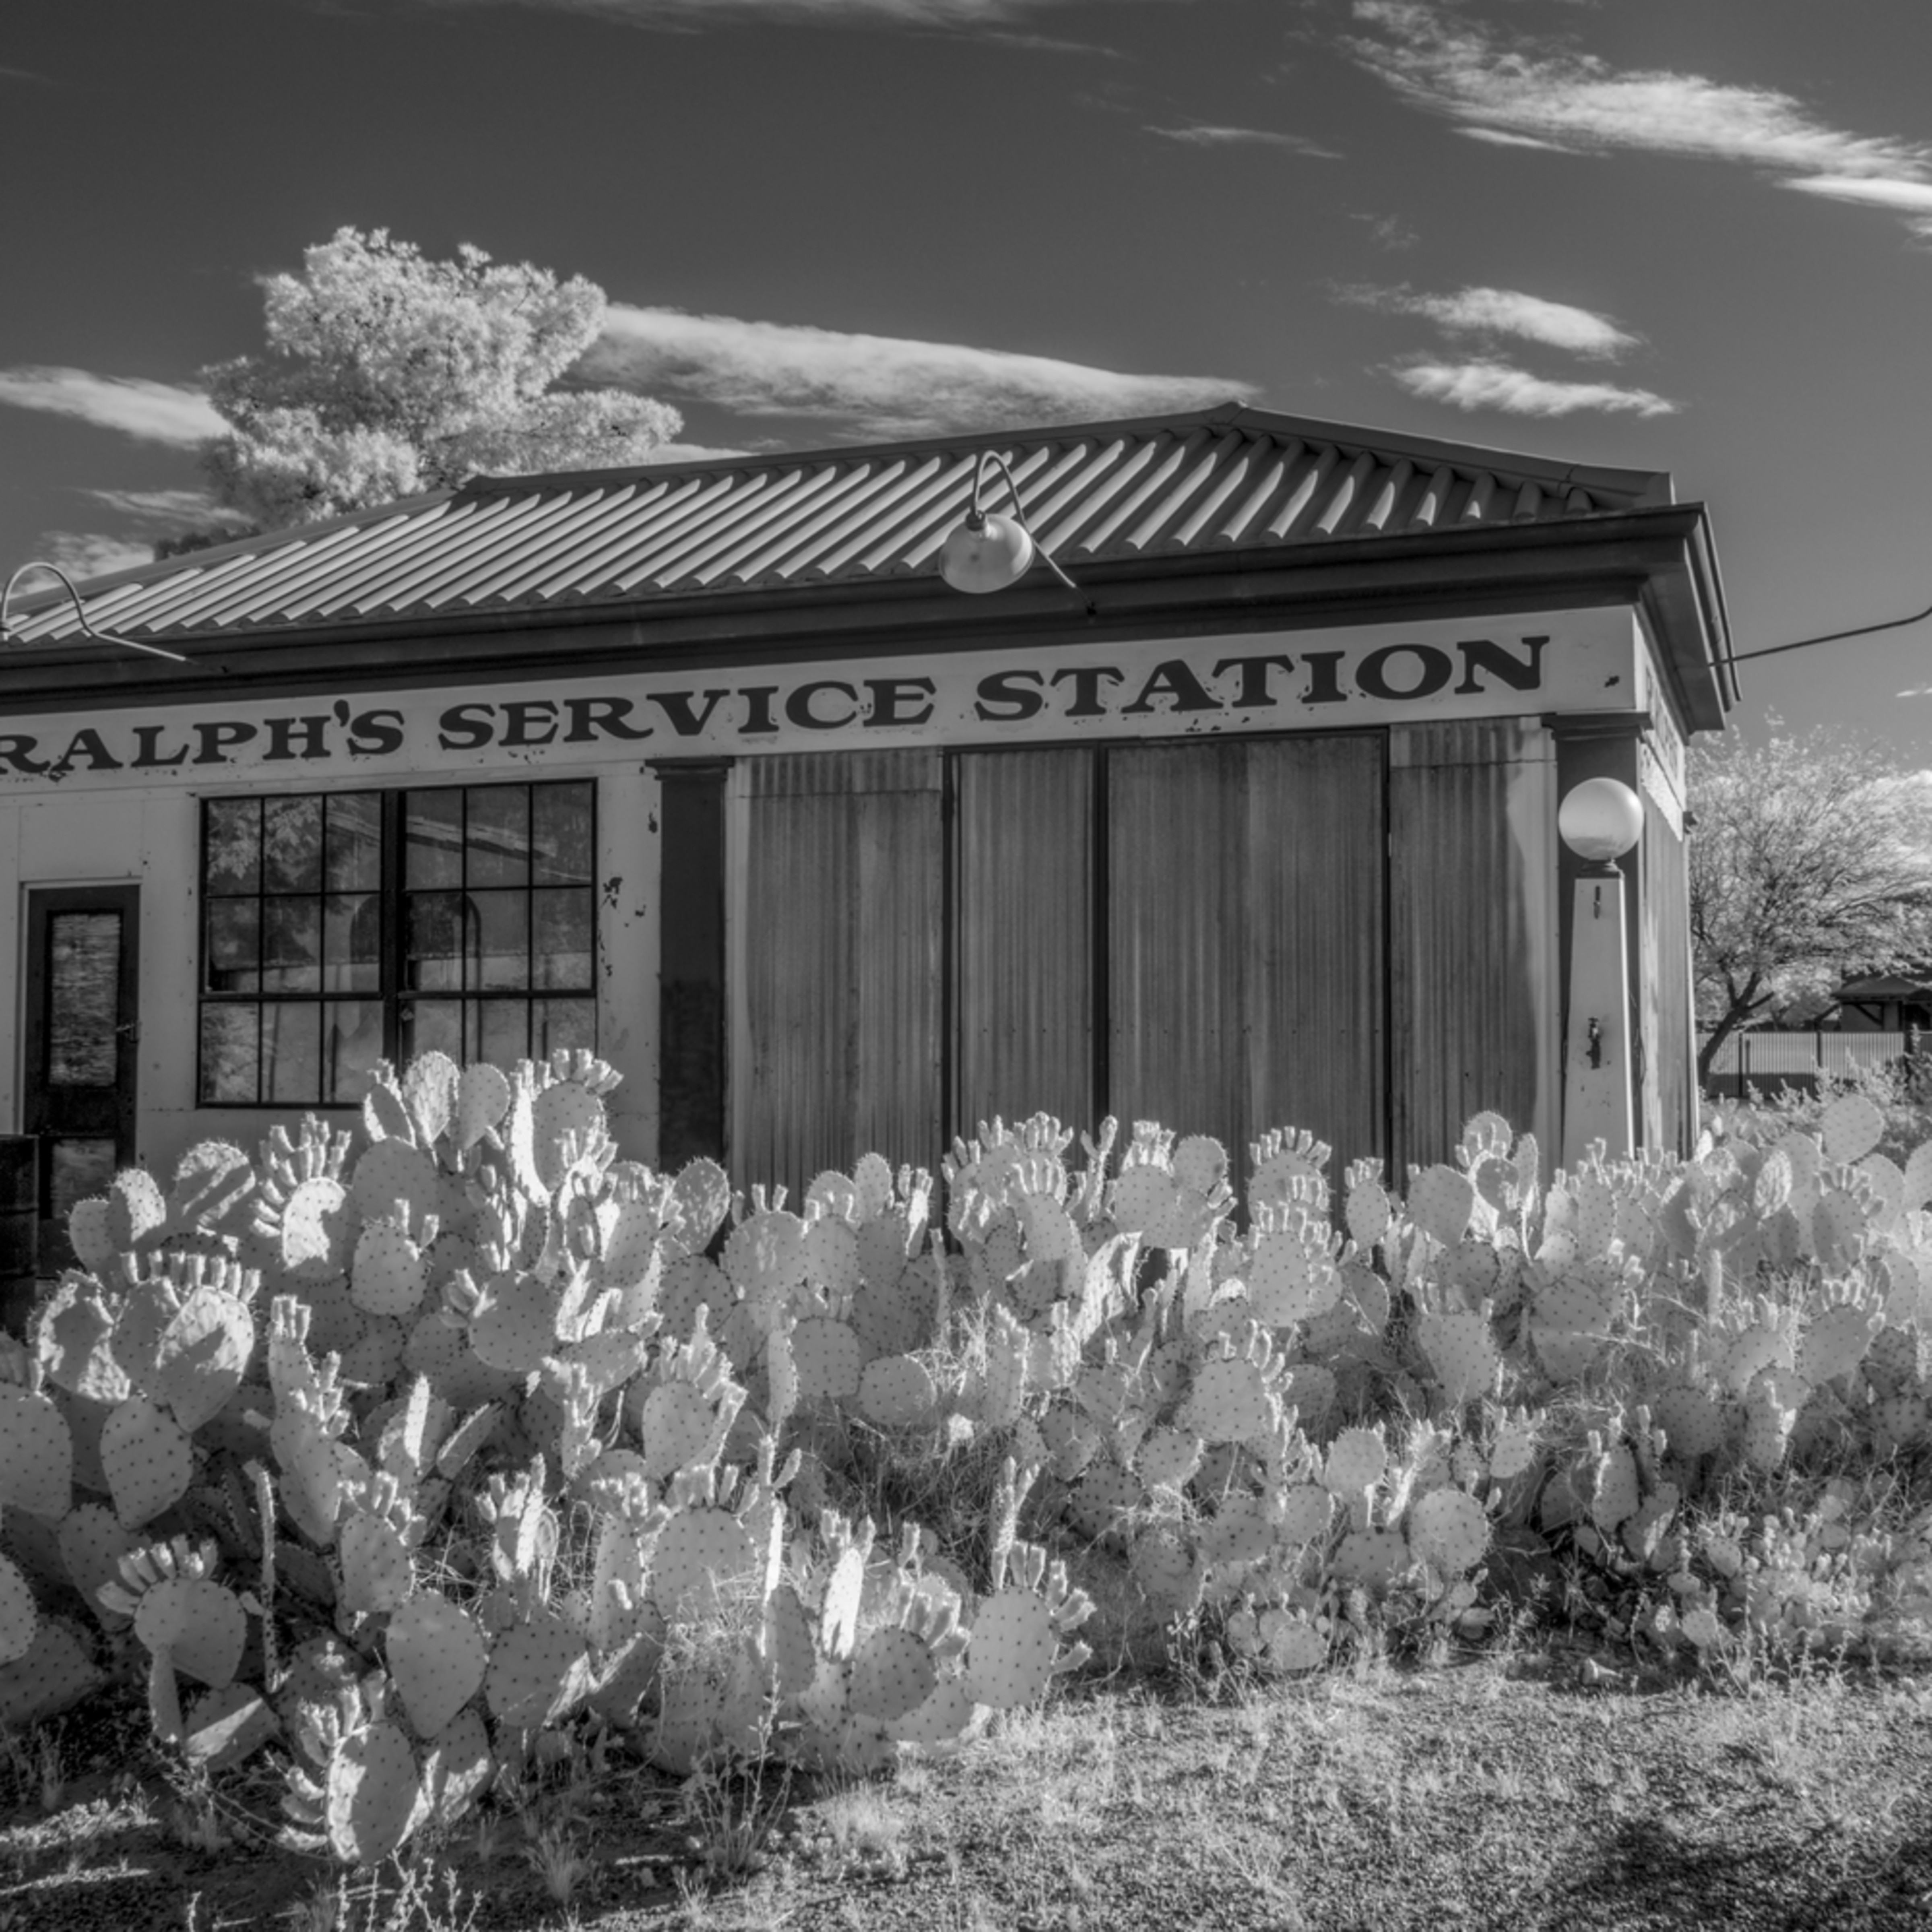 Dp483 ralph s service station n3bkql